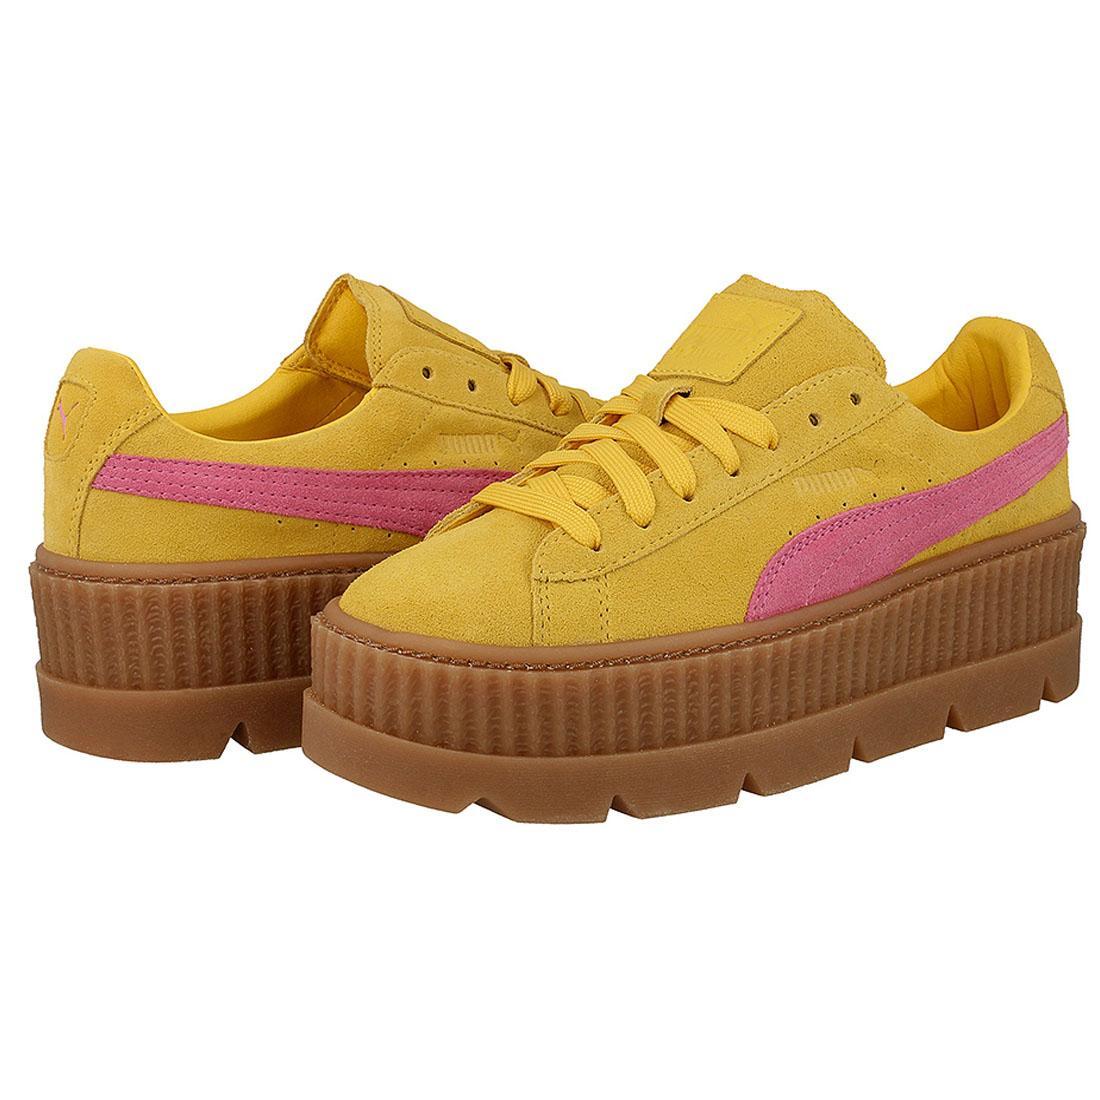 puma fenty yellow